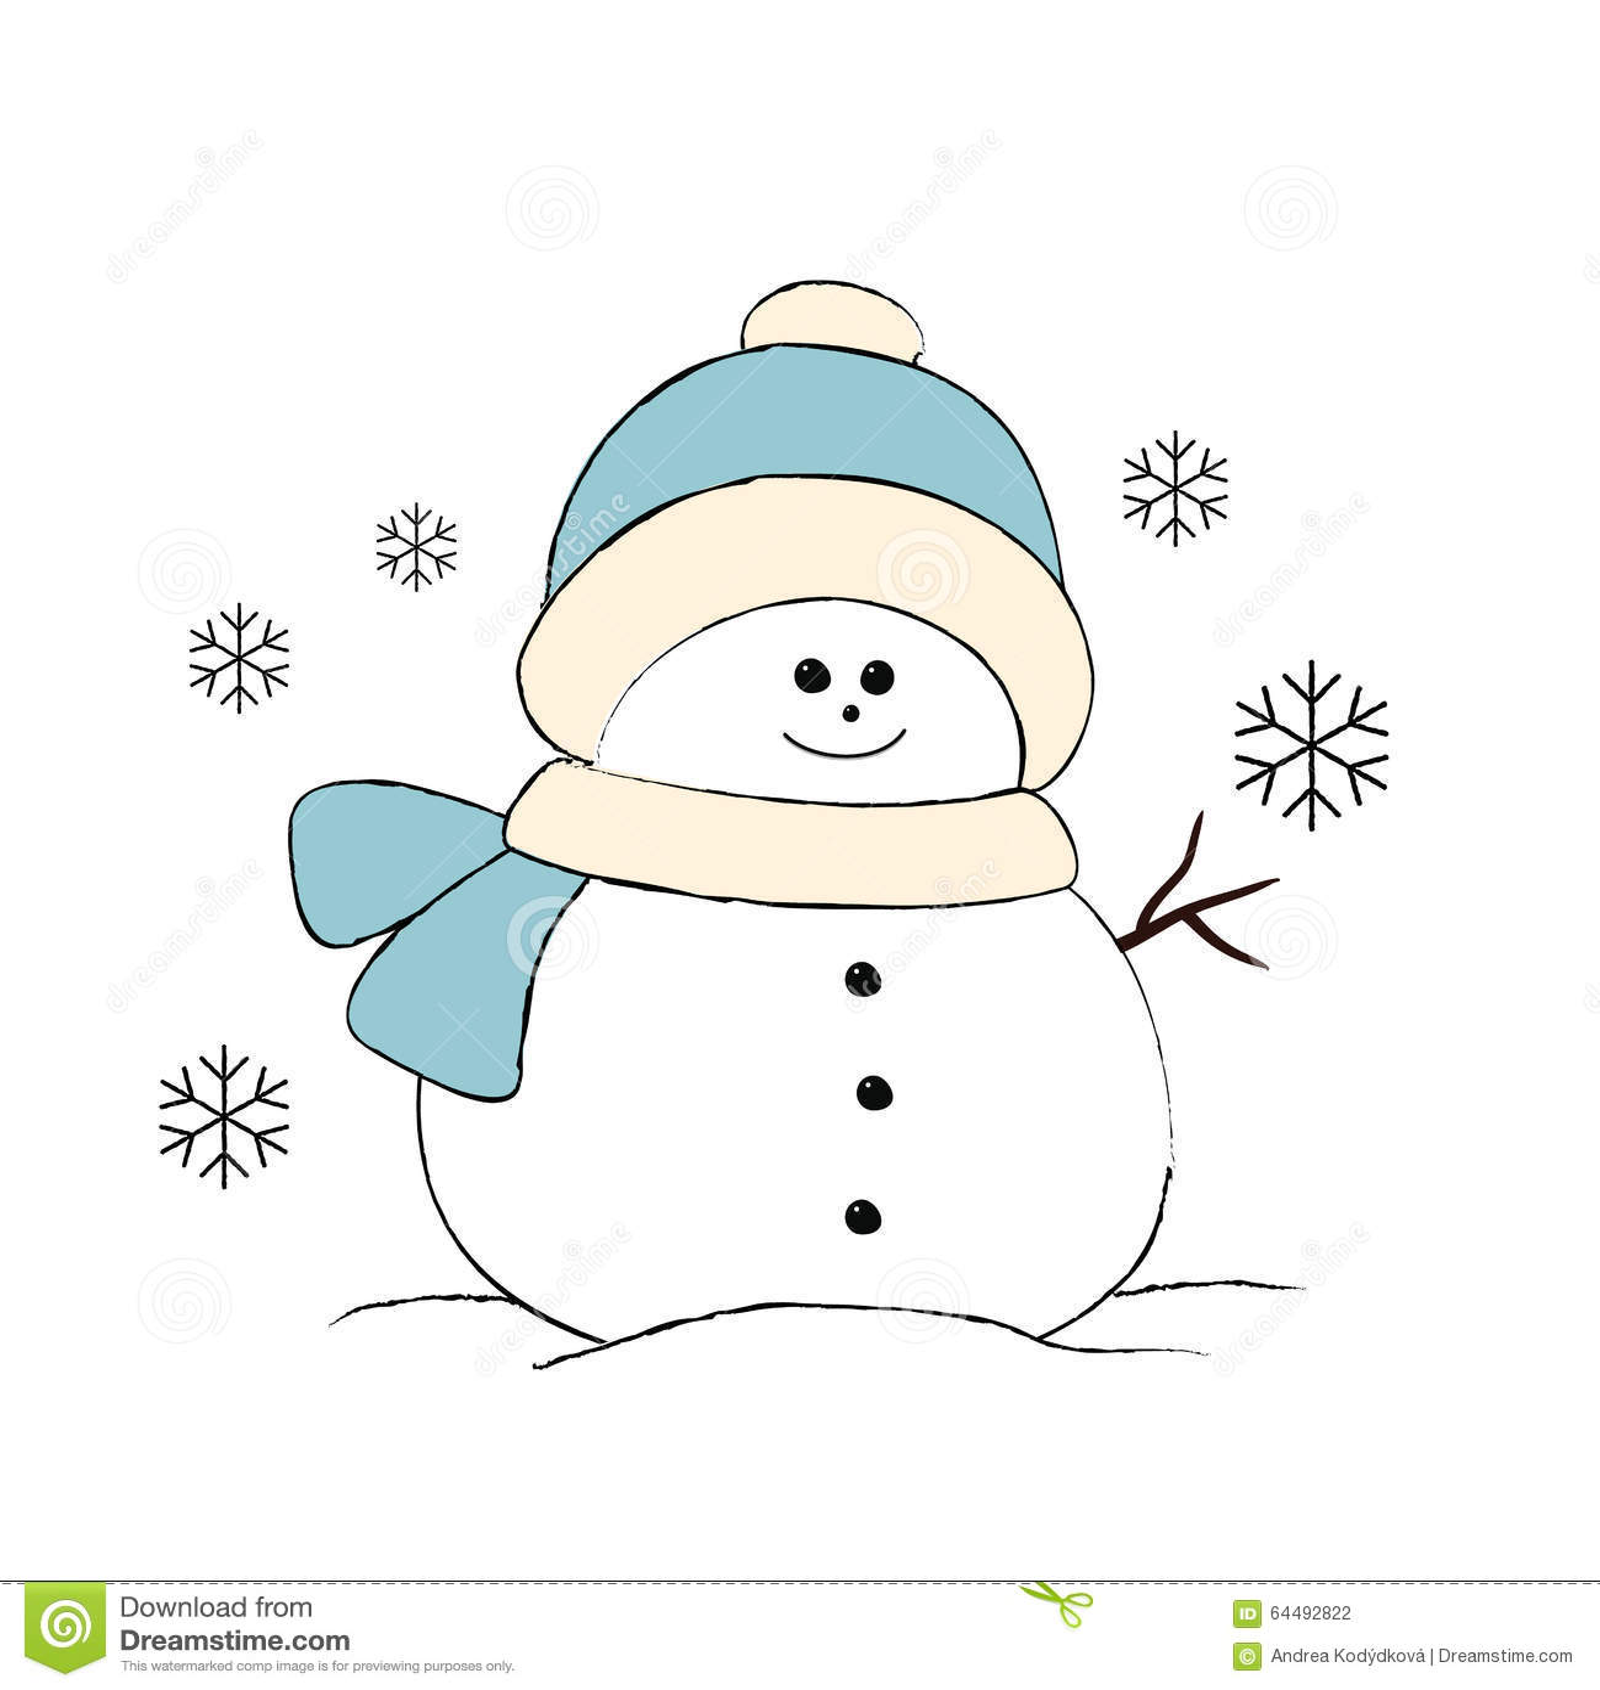 Cute Snowman Simple Illustration On White Stock Vector